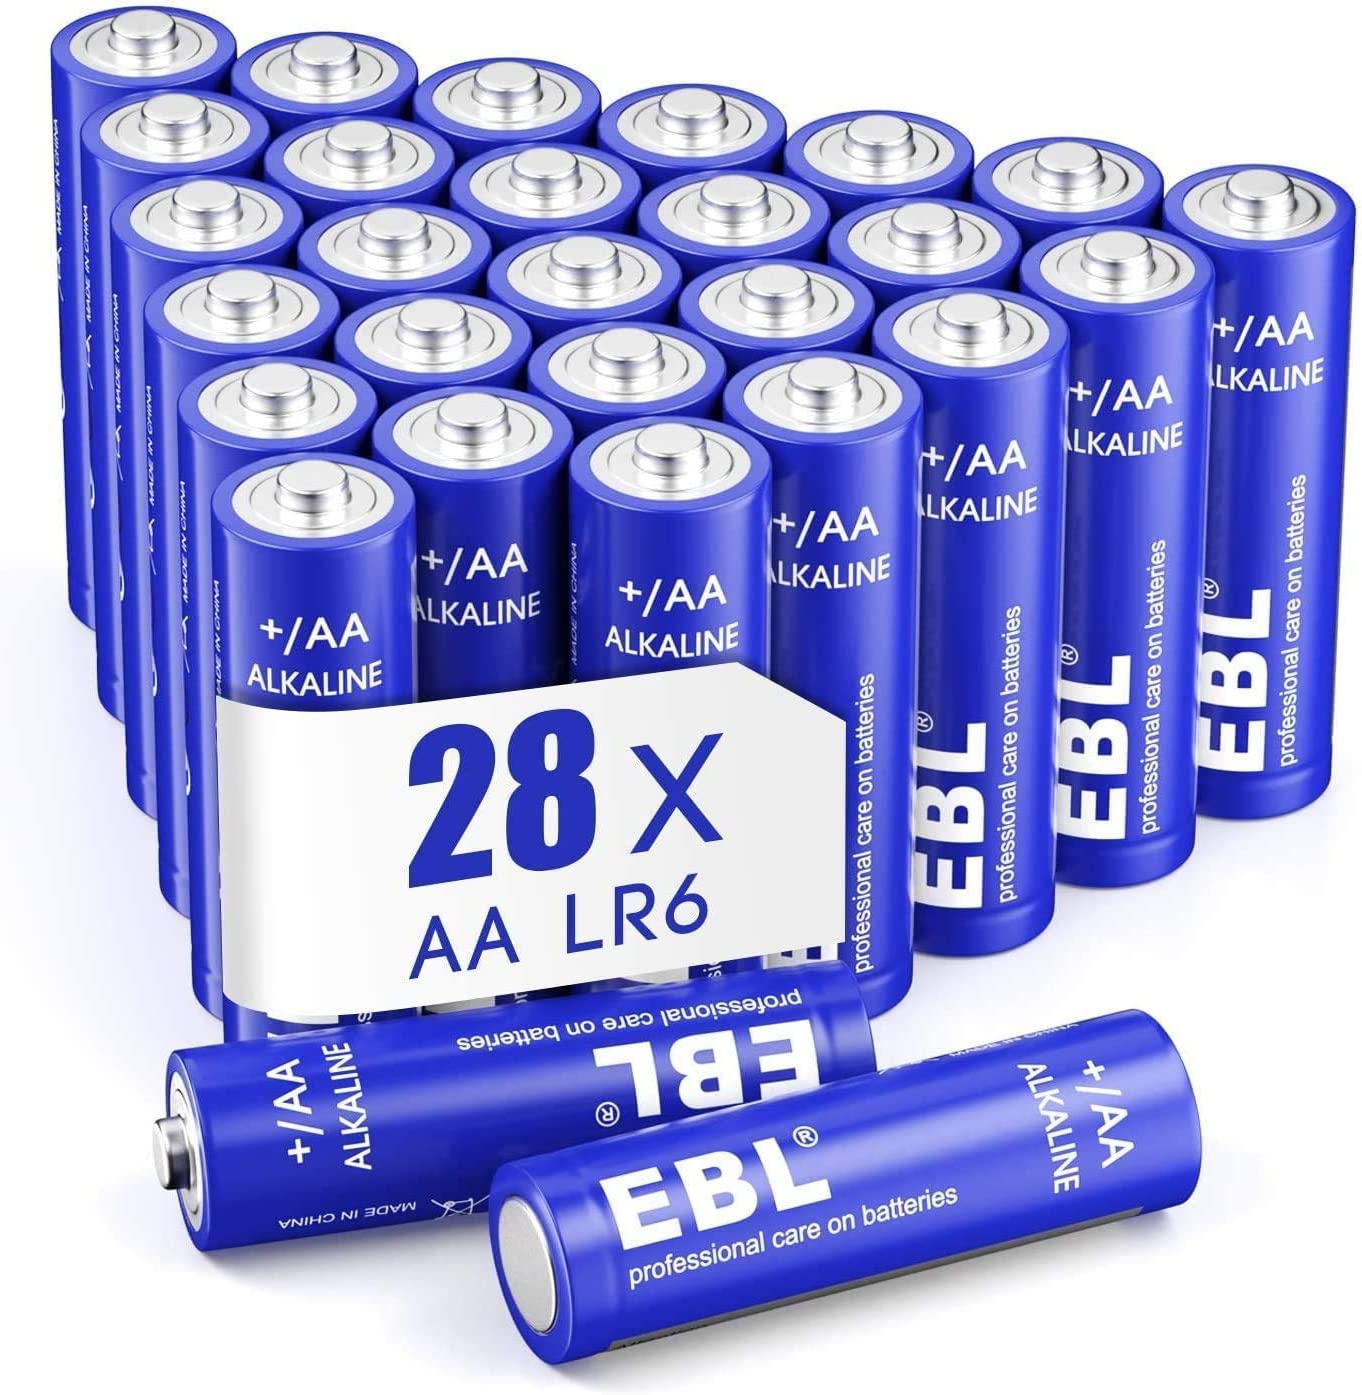 Ebl Aa Batterie Aa Alkaline Batterien Aa Mignon Elektronik